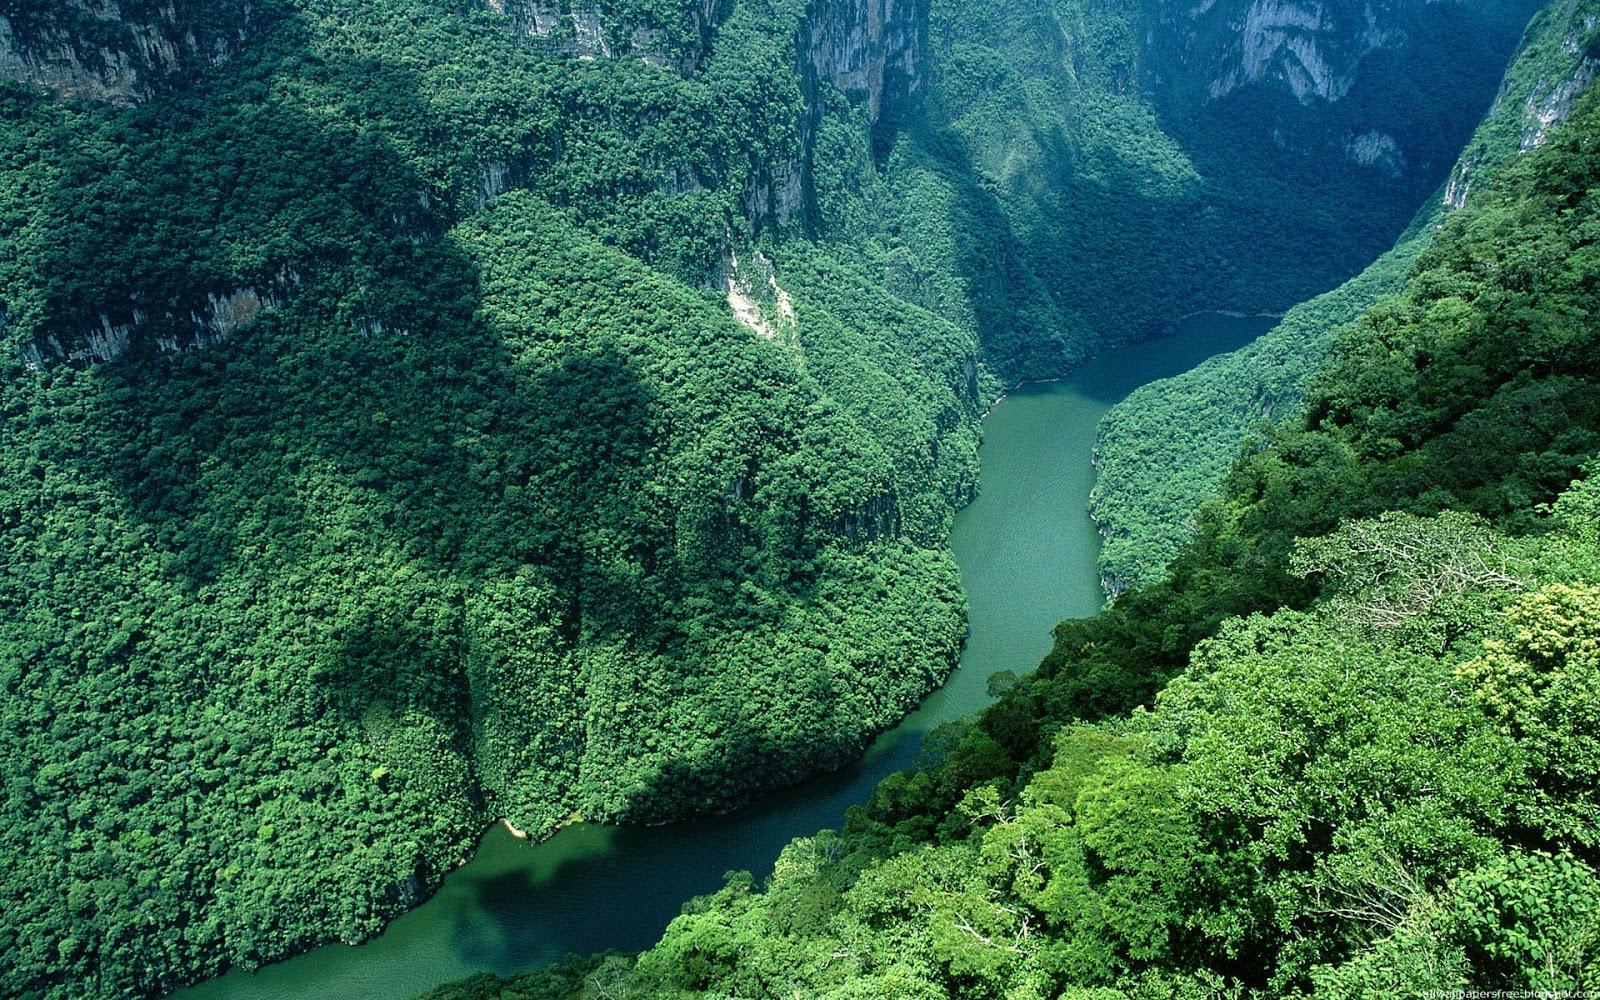 Evergreen Forest Scenery Wallpaper